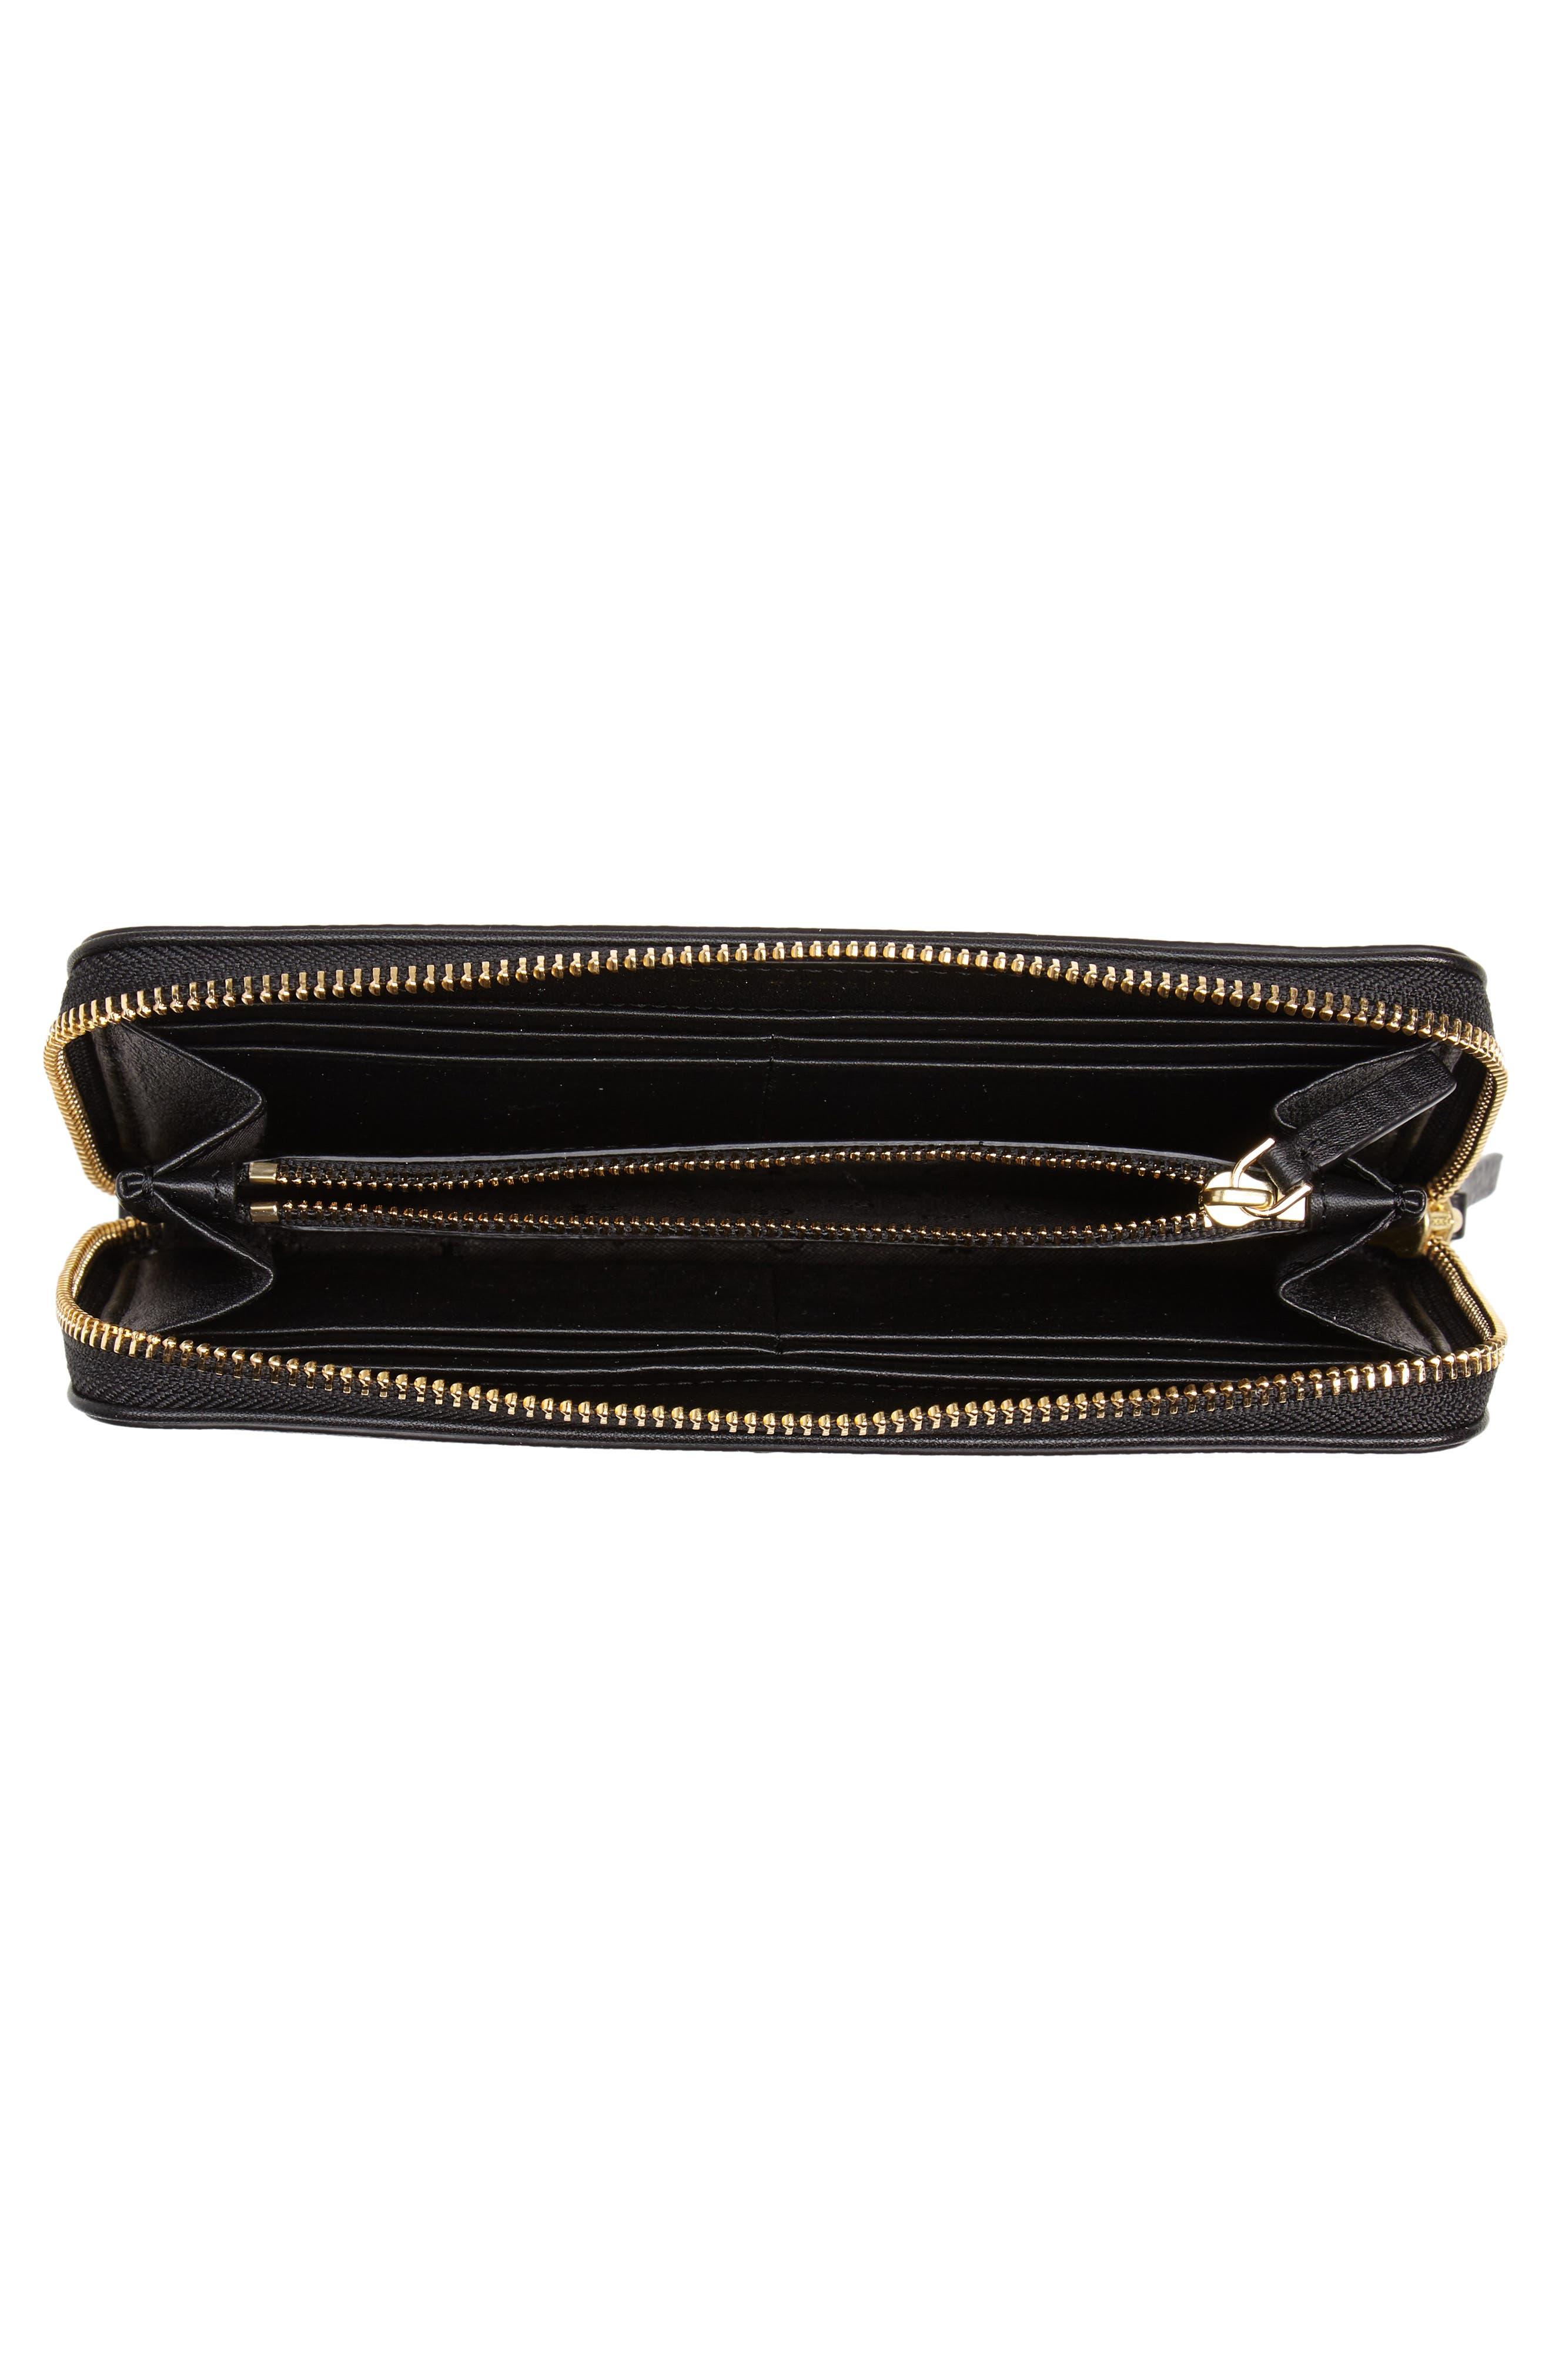 Marsden Leather Zip Around Wallet,                             Alternate thumbnail 10, color,